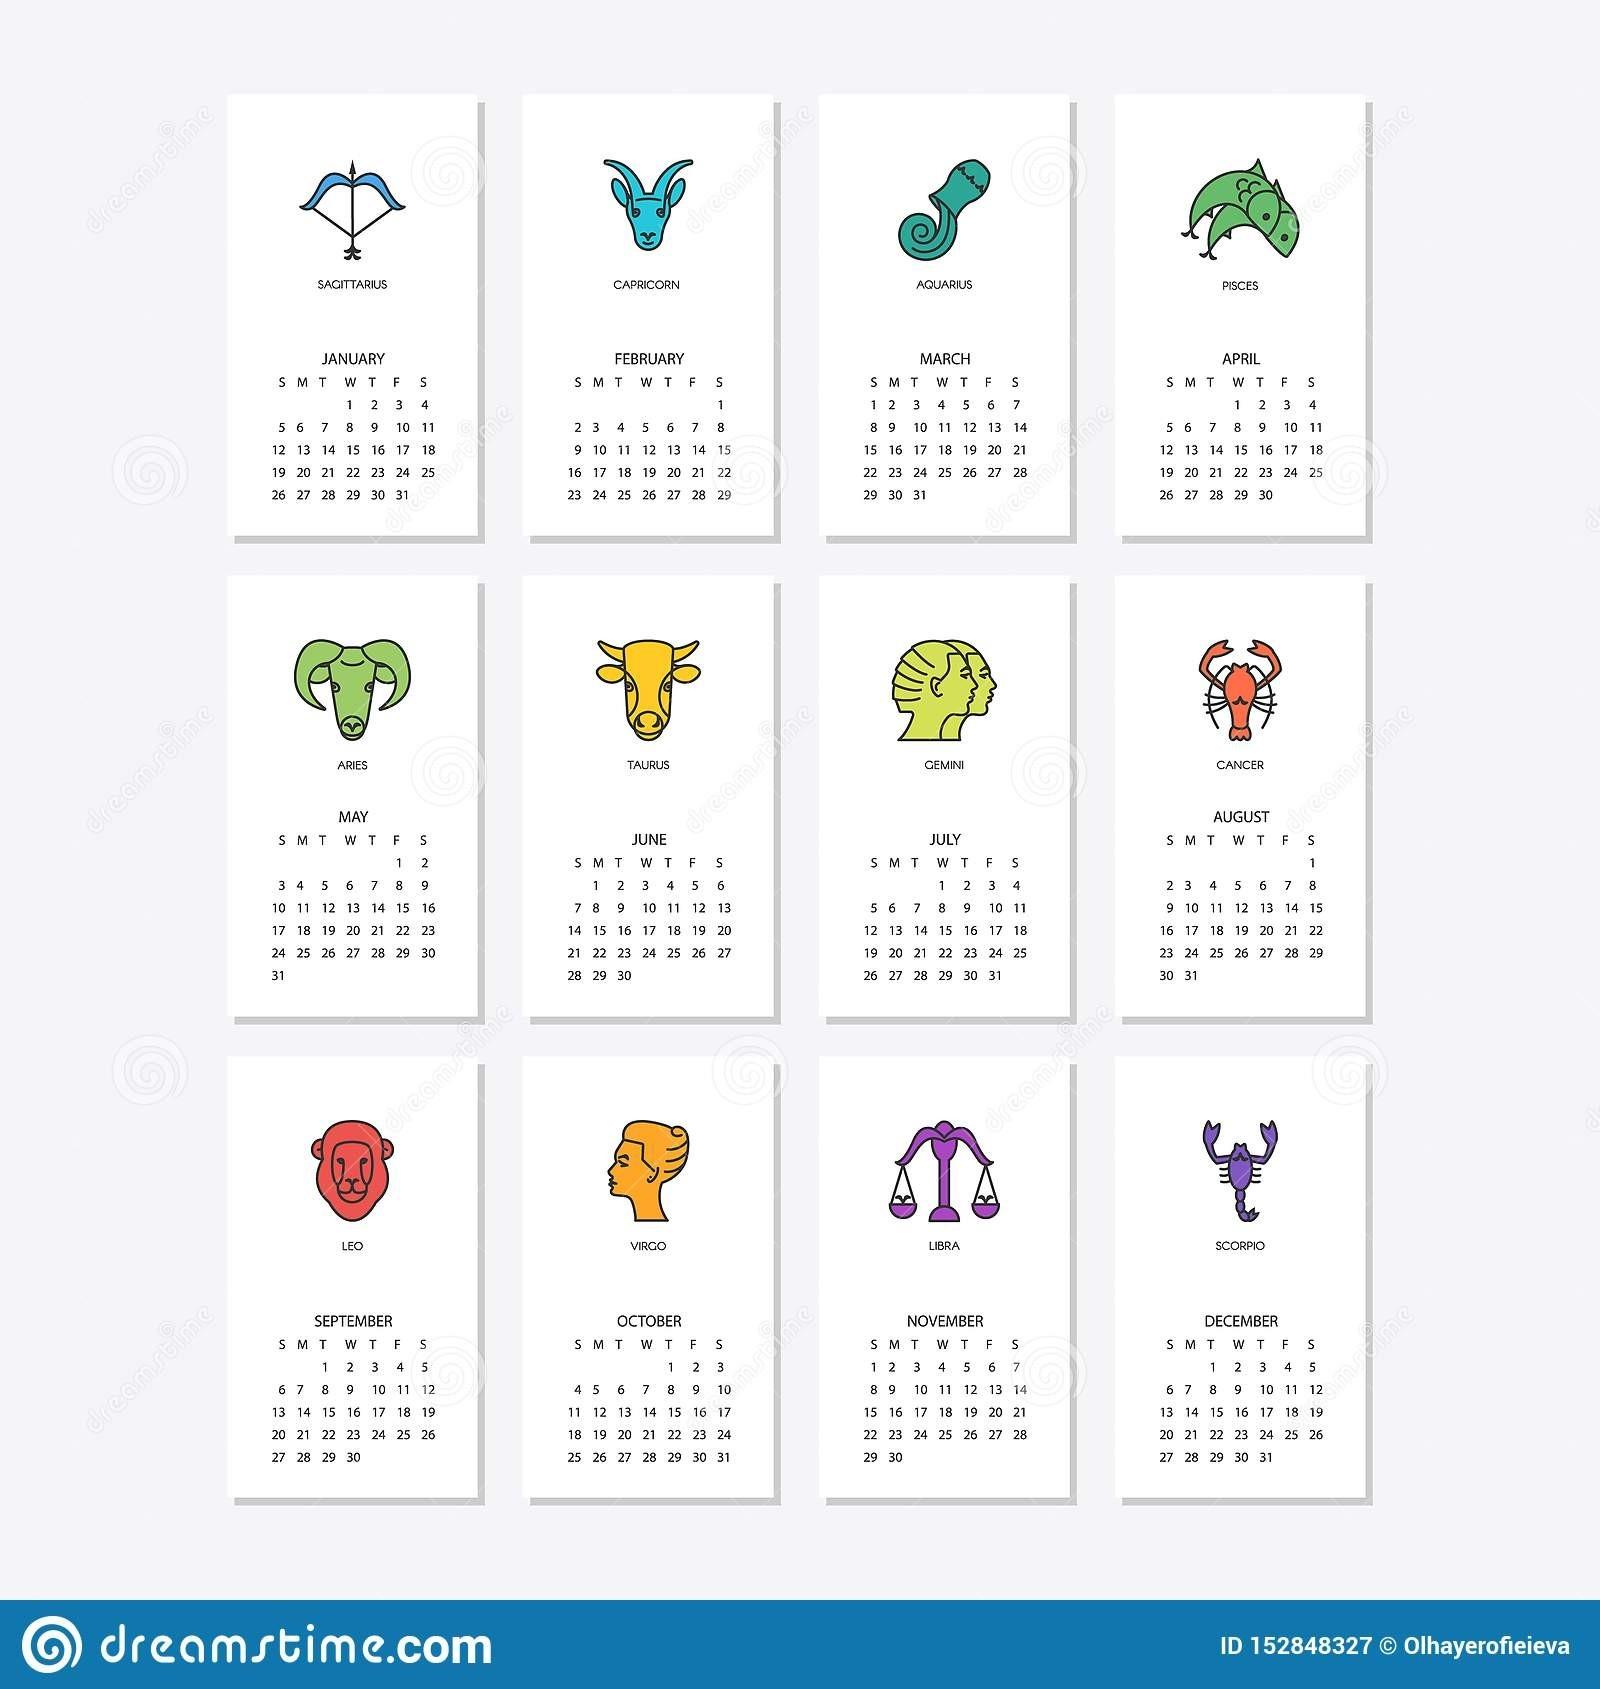 Calendar 2020 With Horoscope Signs Zodiac Symbols Set Stock  2020 Calendar With Zodiac Signs